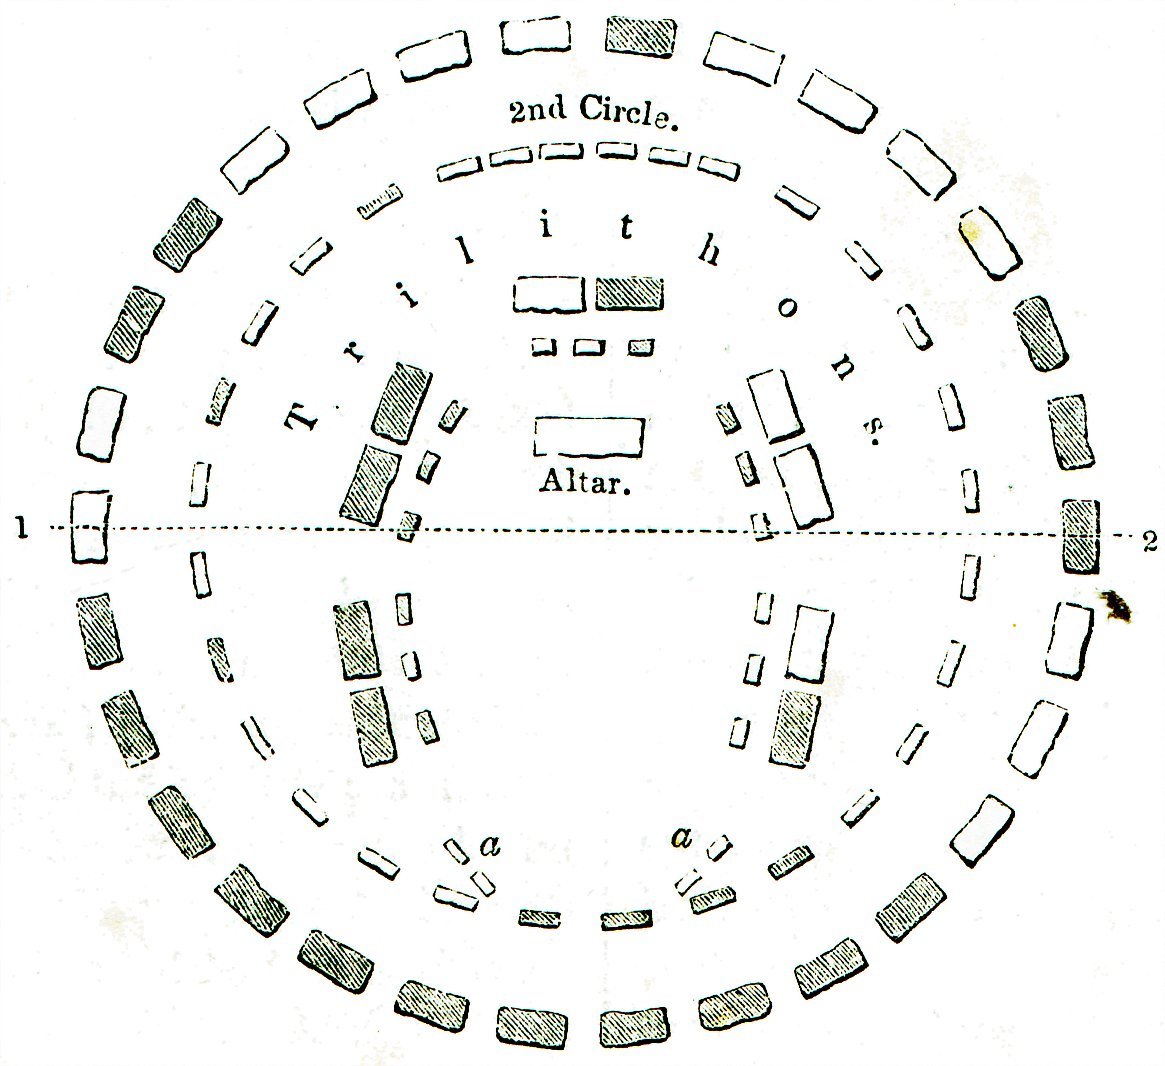 http://1.bp.blogspot.com/_GMMF0Fofnxg/TJiEu12rNmI/AAAAAAAAAQo/l0-igyQM7Do/s1600/12.planta+de+stonehenge.jpg